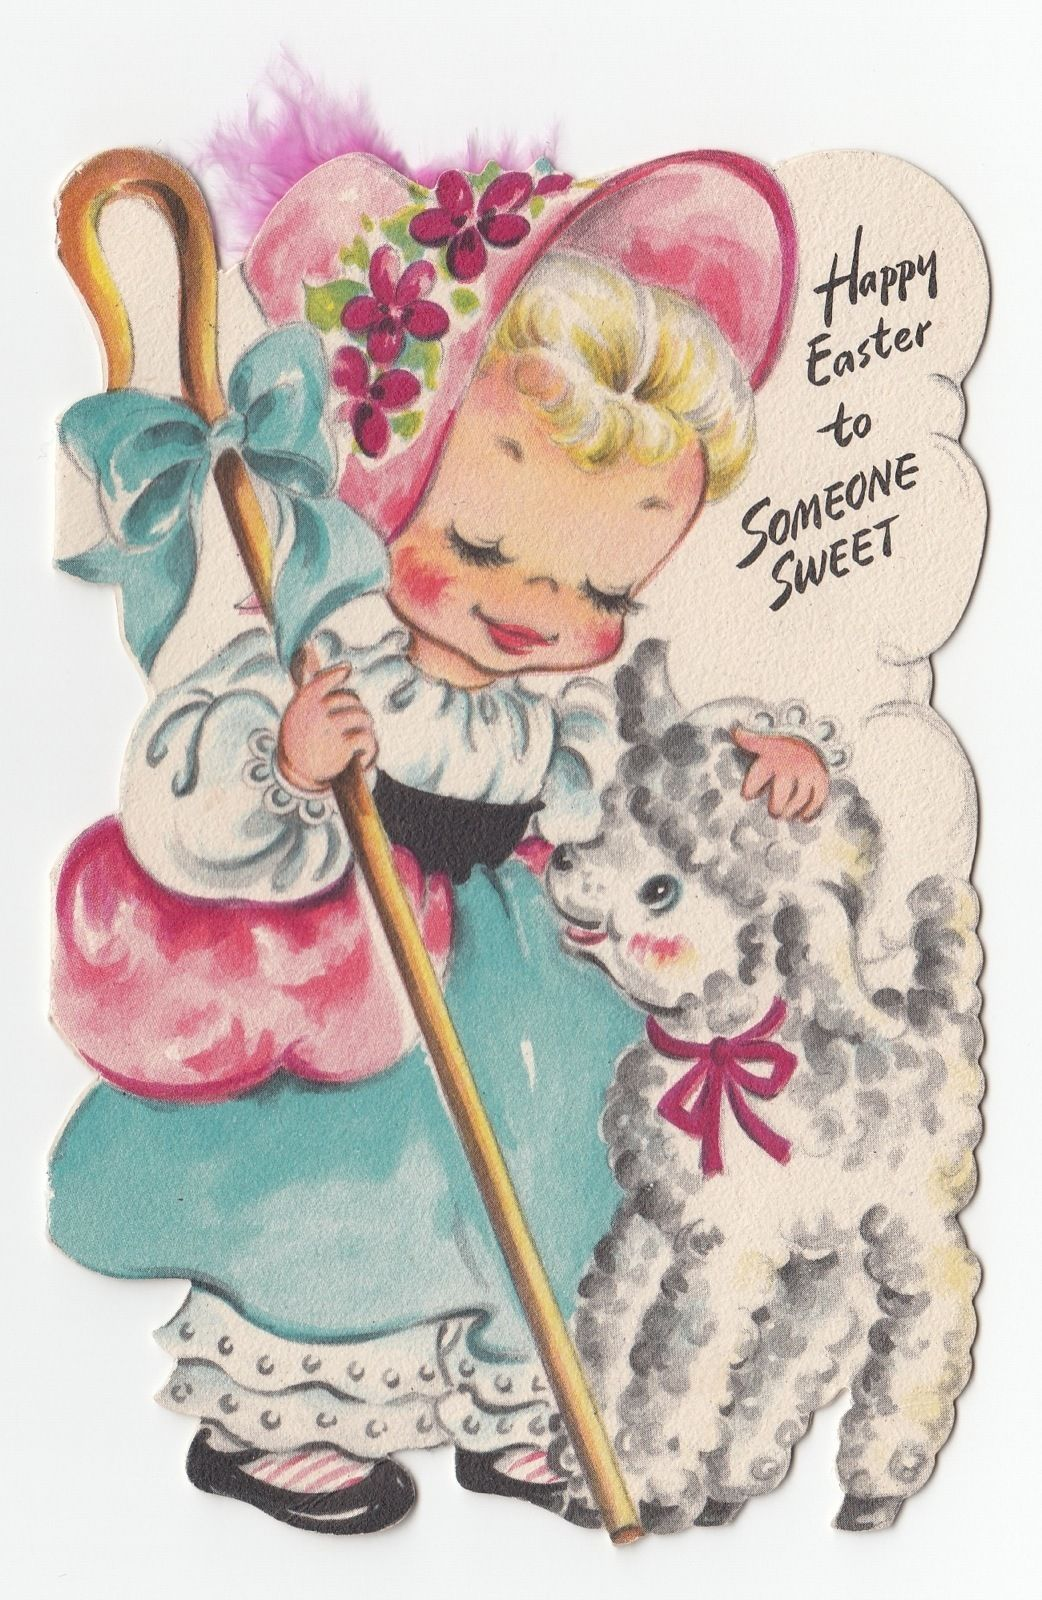 Vintage Greeting Card Easter Hallmark Die Cut 1940s Cute Little Girl Lamb Sheep